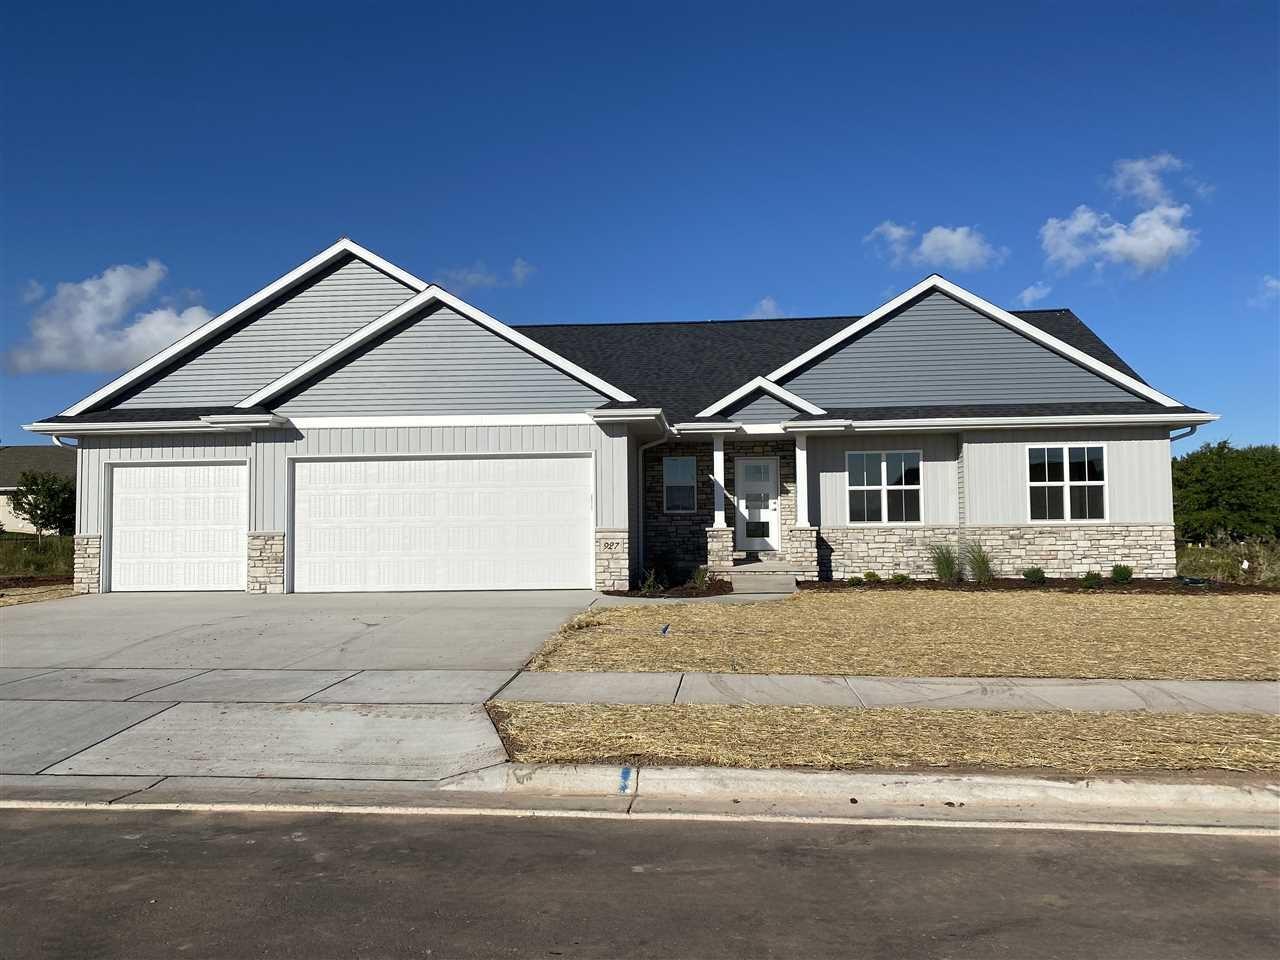 927 MENDOTA Drive, Green Bay, WI 54311 - MLS#: 50225075